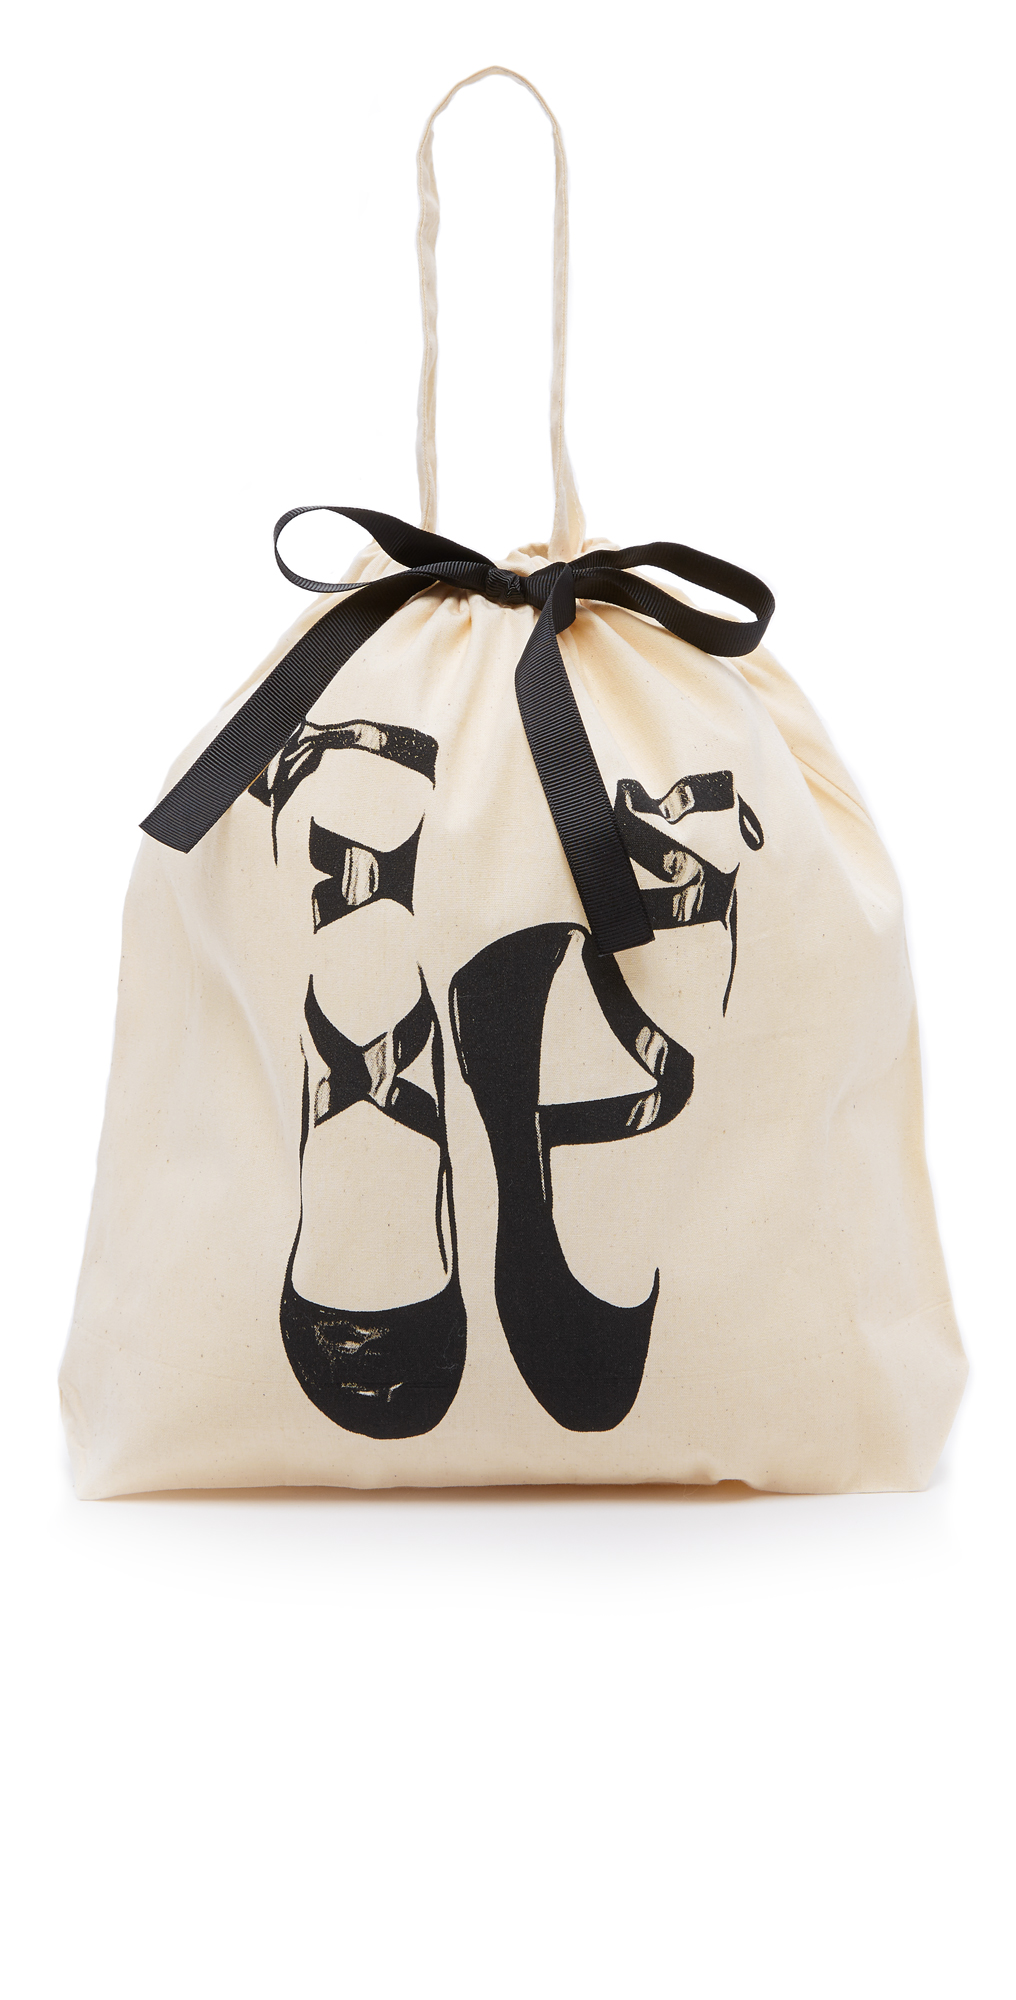 Pointe Ballerina Organizing Bag Bag-all